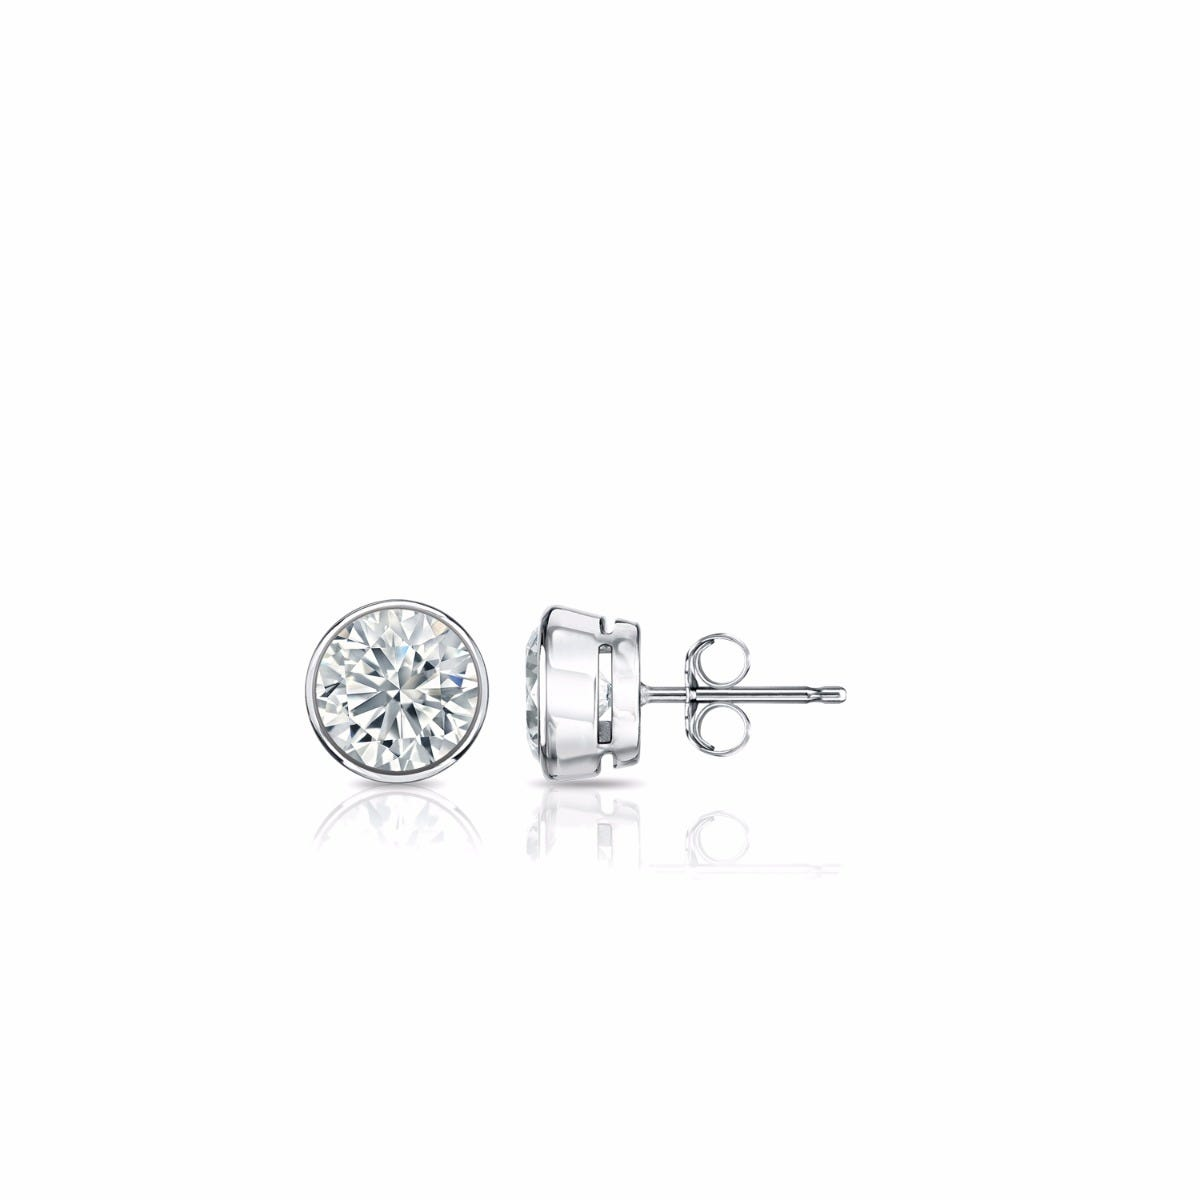 Bezel-Set Round 1/10ctw. Diamond Solitaire Stud Earrings (IJ, SI2) in Platinum